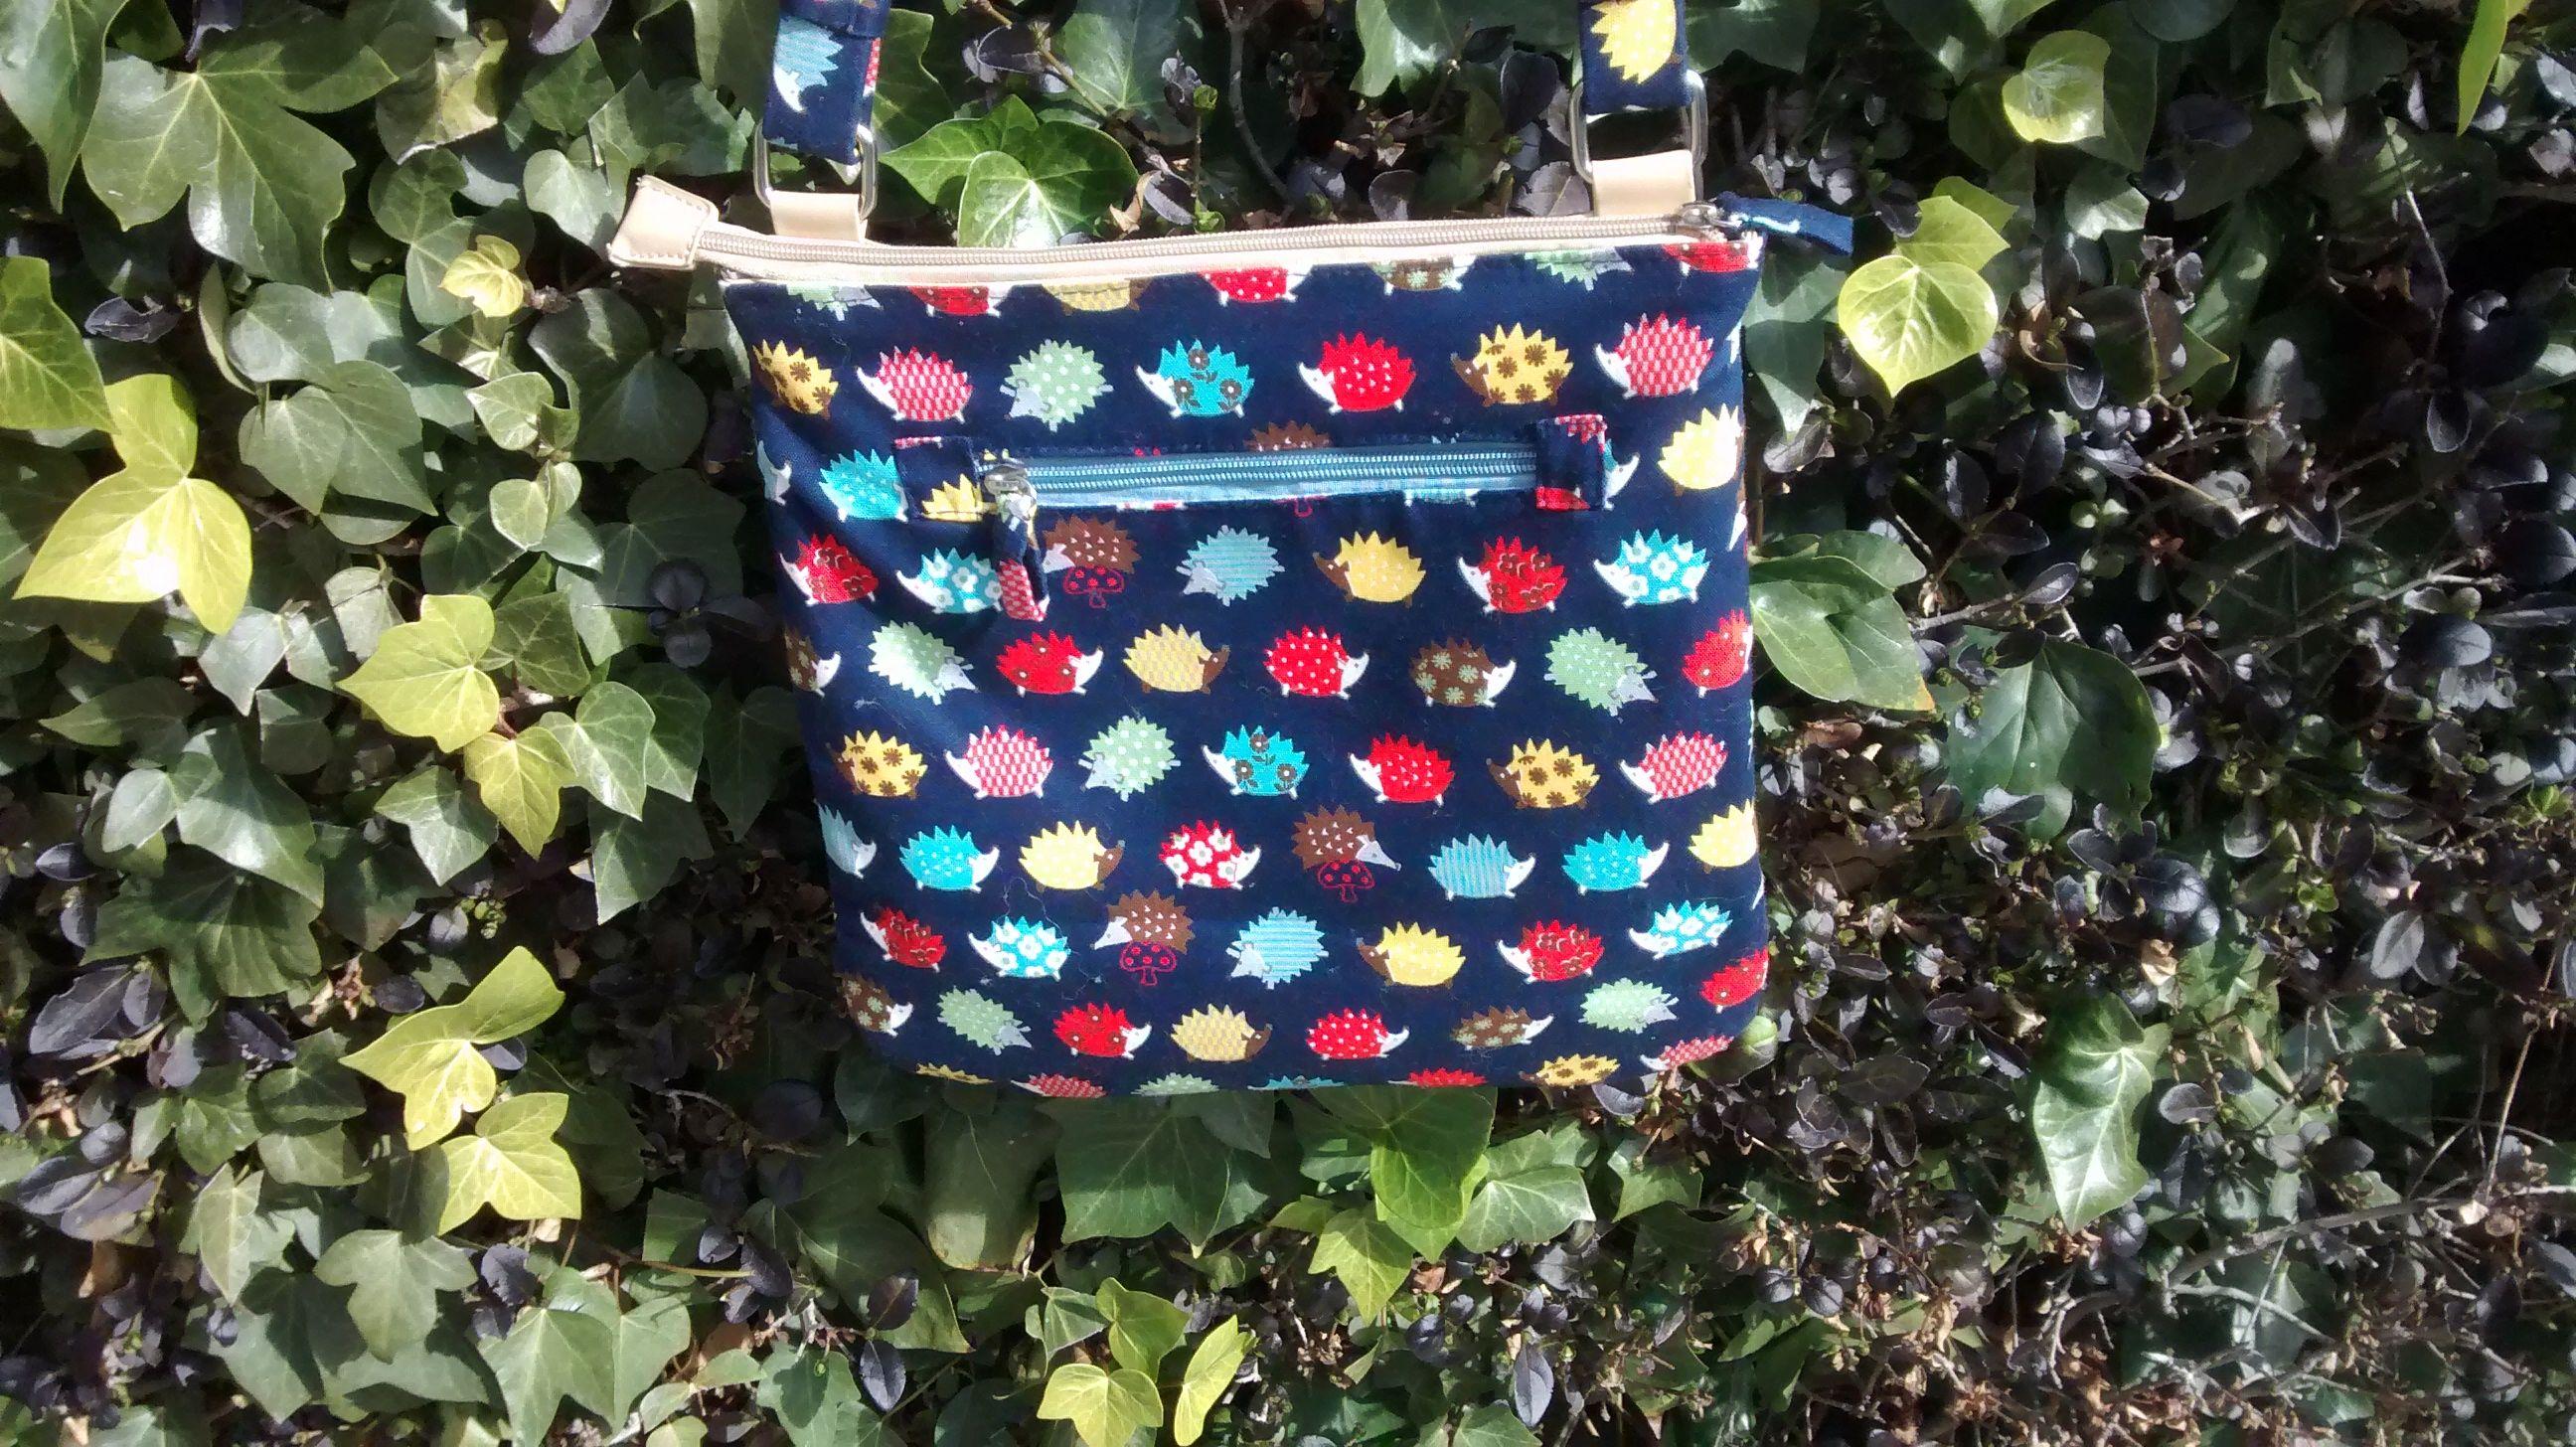 Renovar un bolso forrándolo con una tela bonita http://cosecosturera.blogspot.com.es/2015/02/forrar-un-bolso-con-una-tela-bonita.html